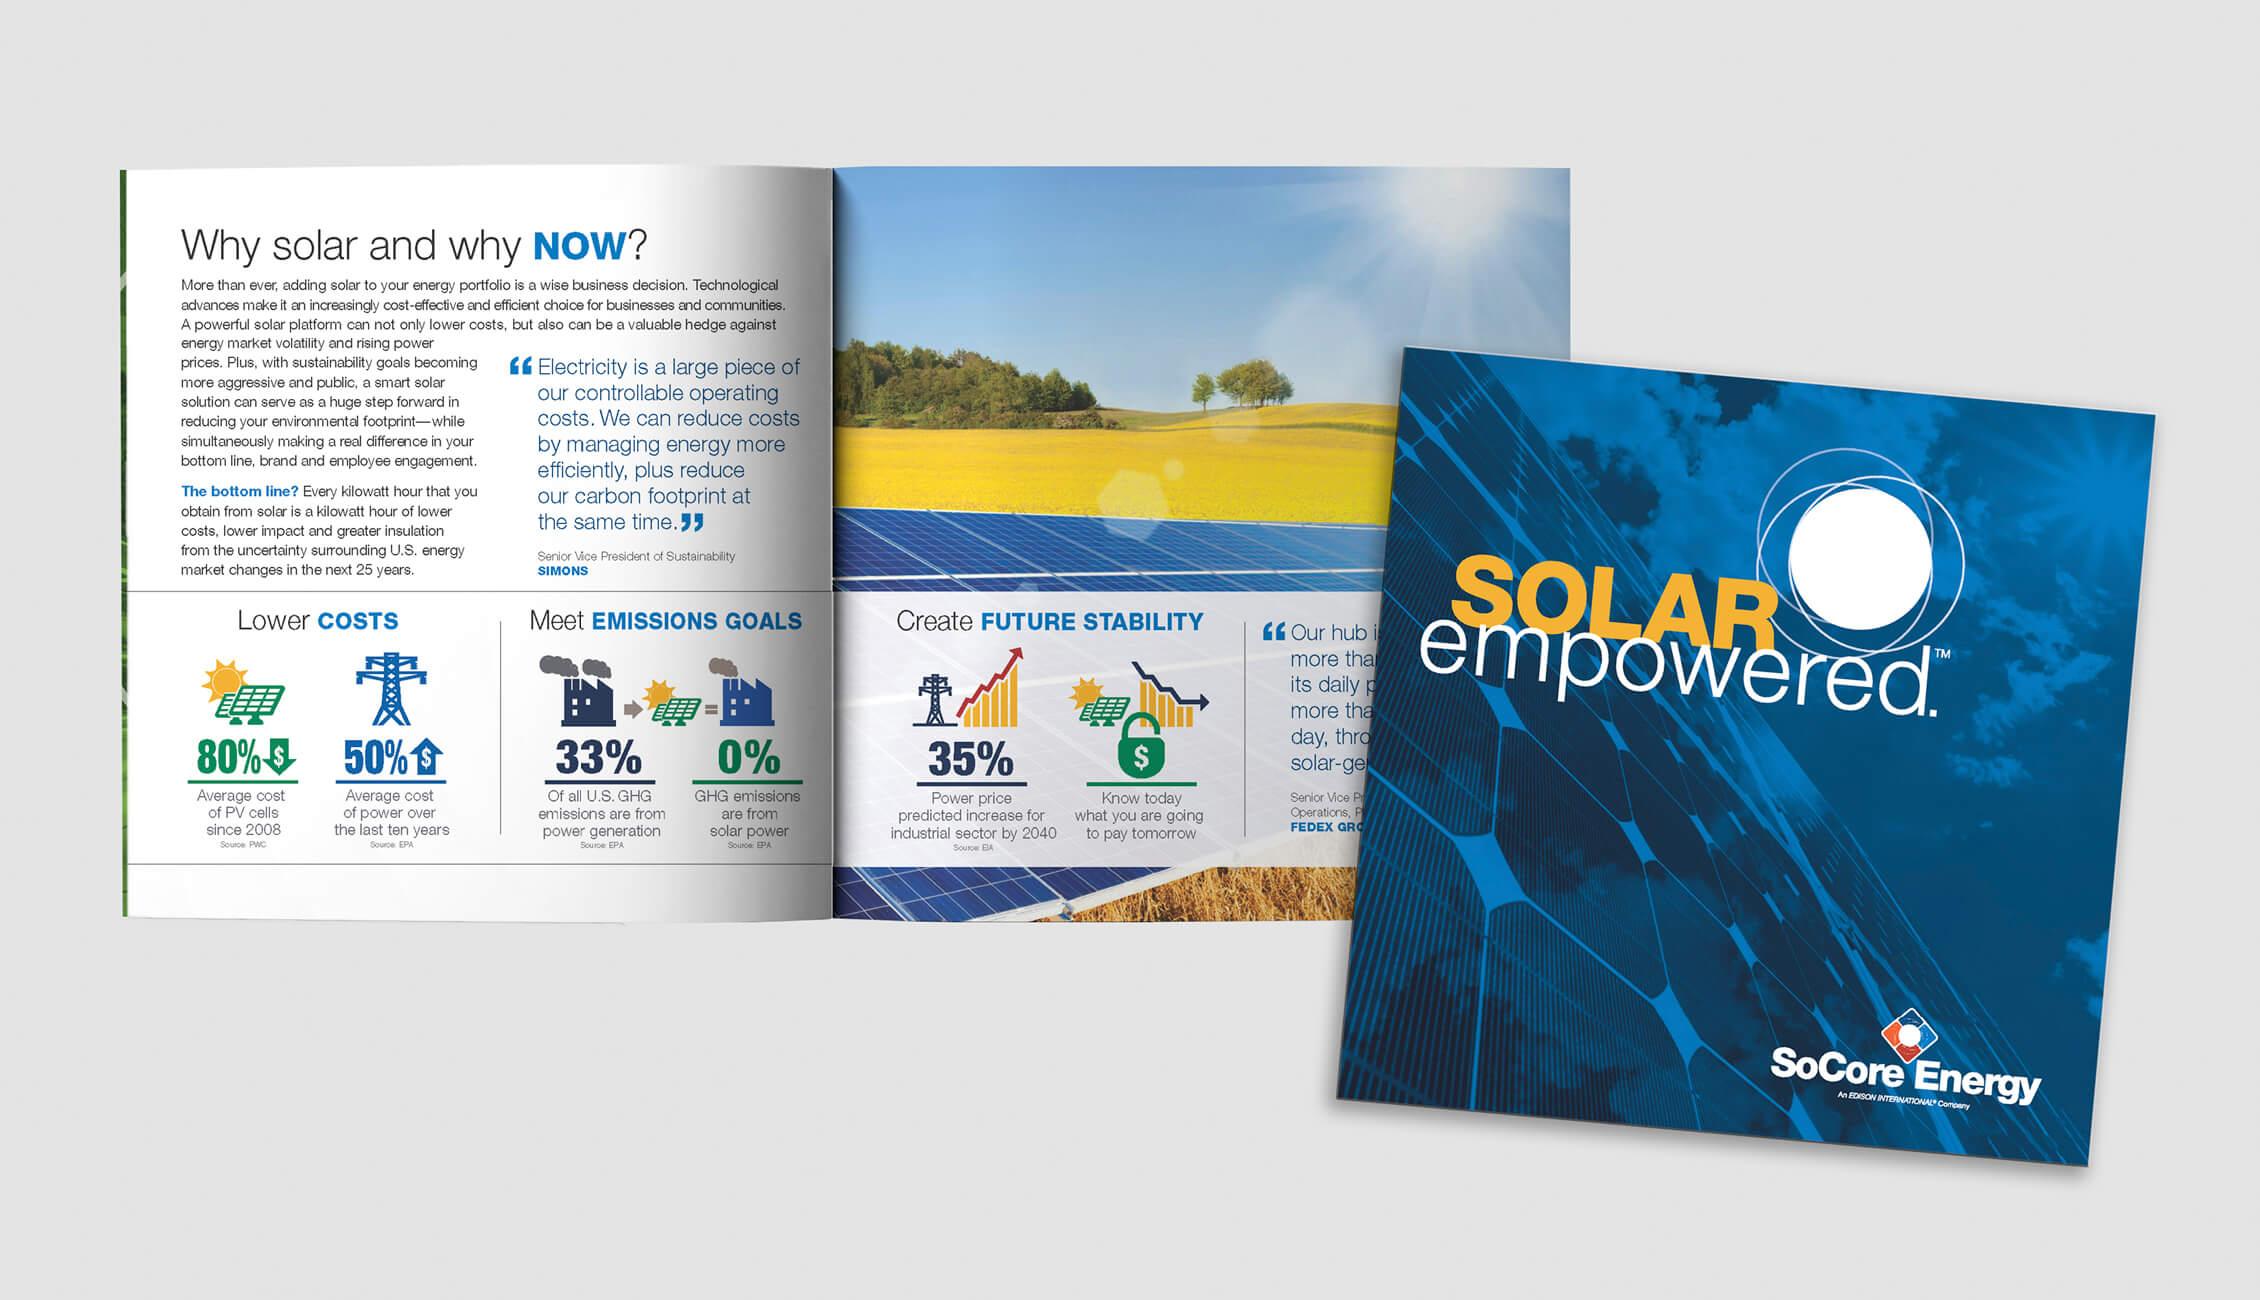 SoCore capabilities brochure image